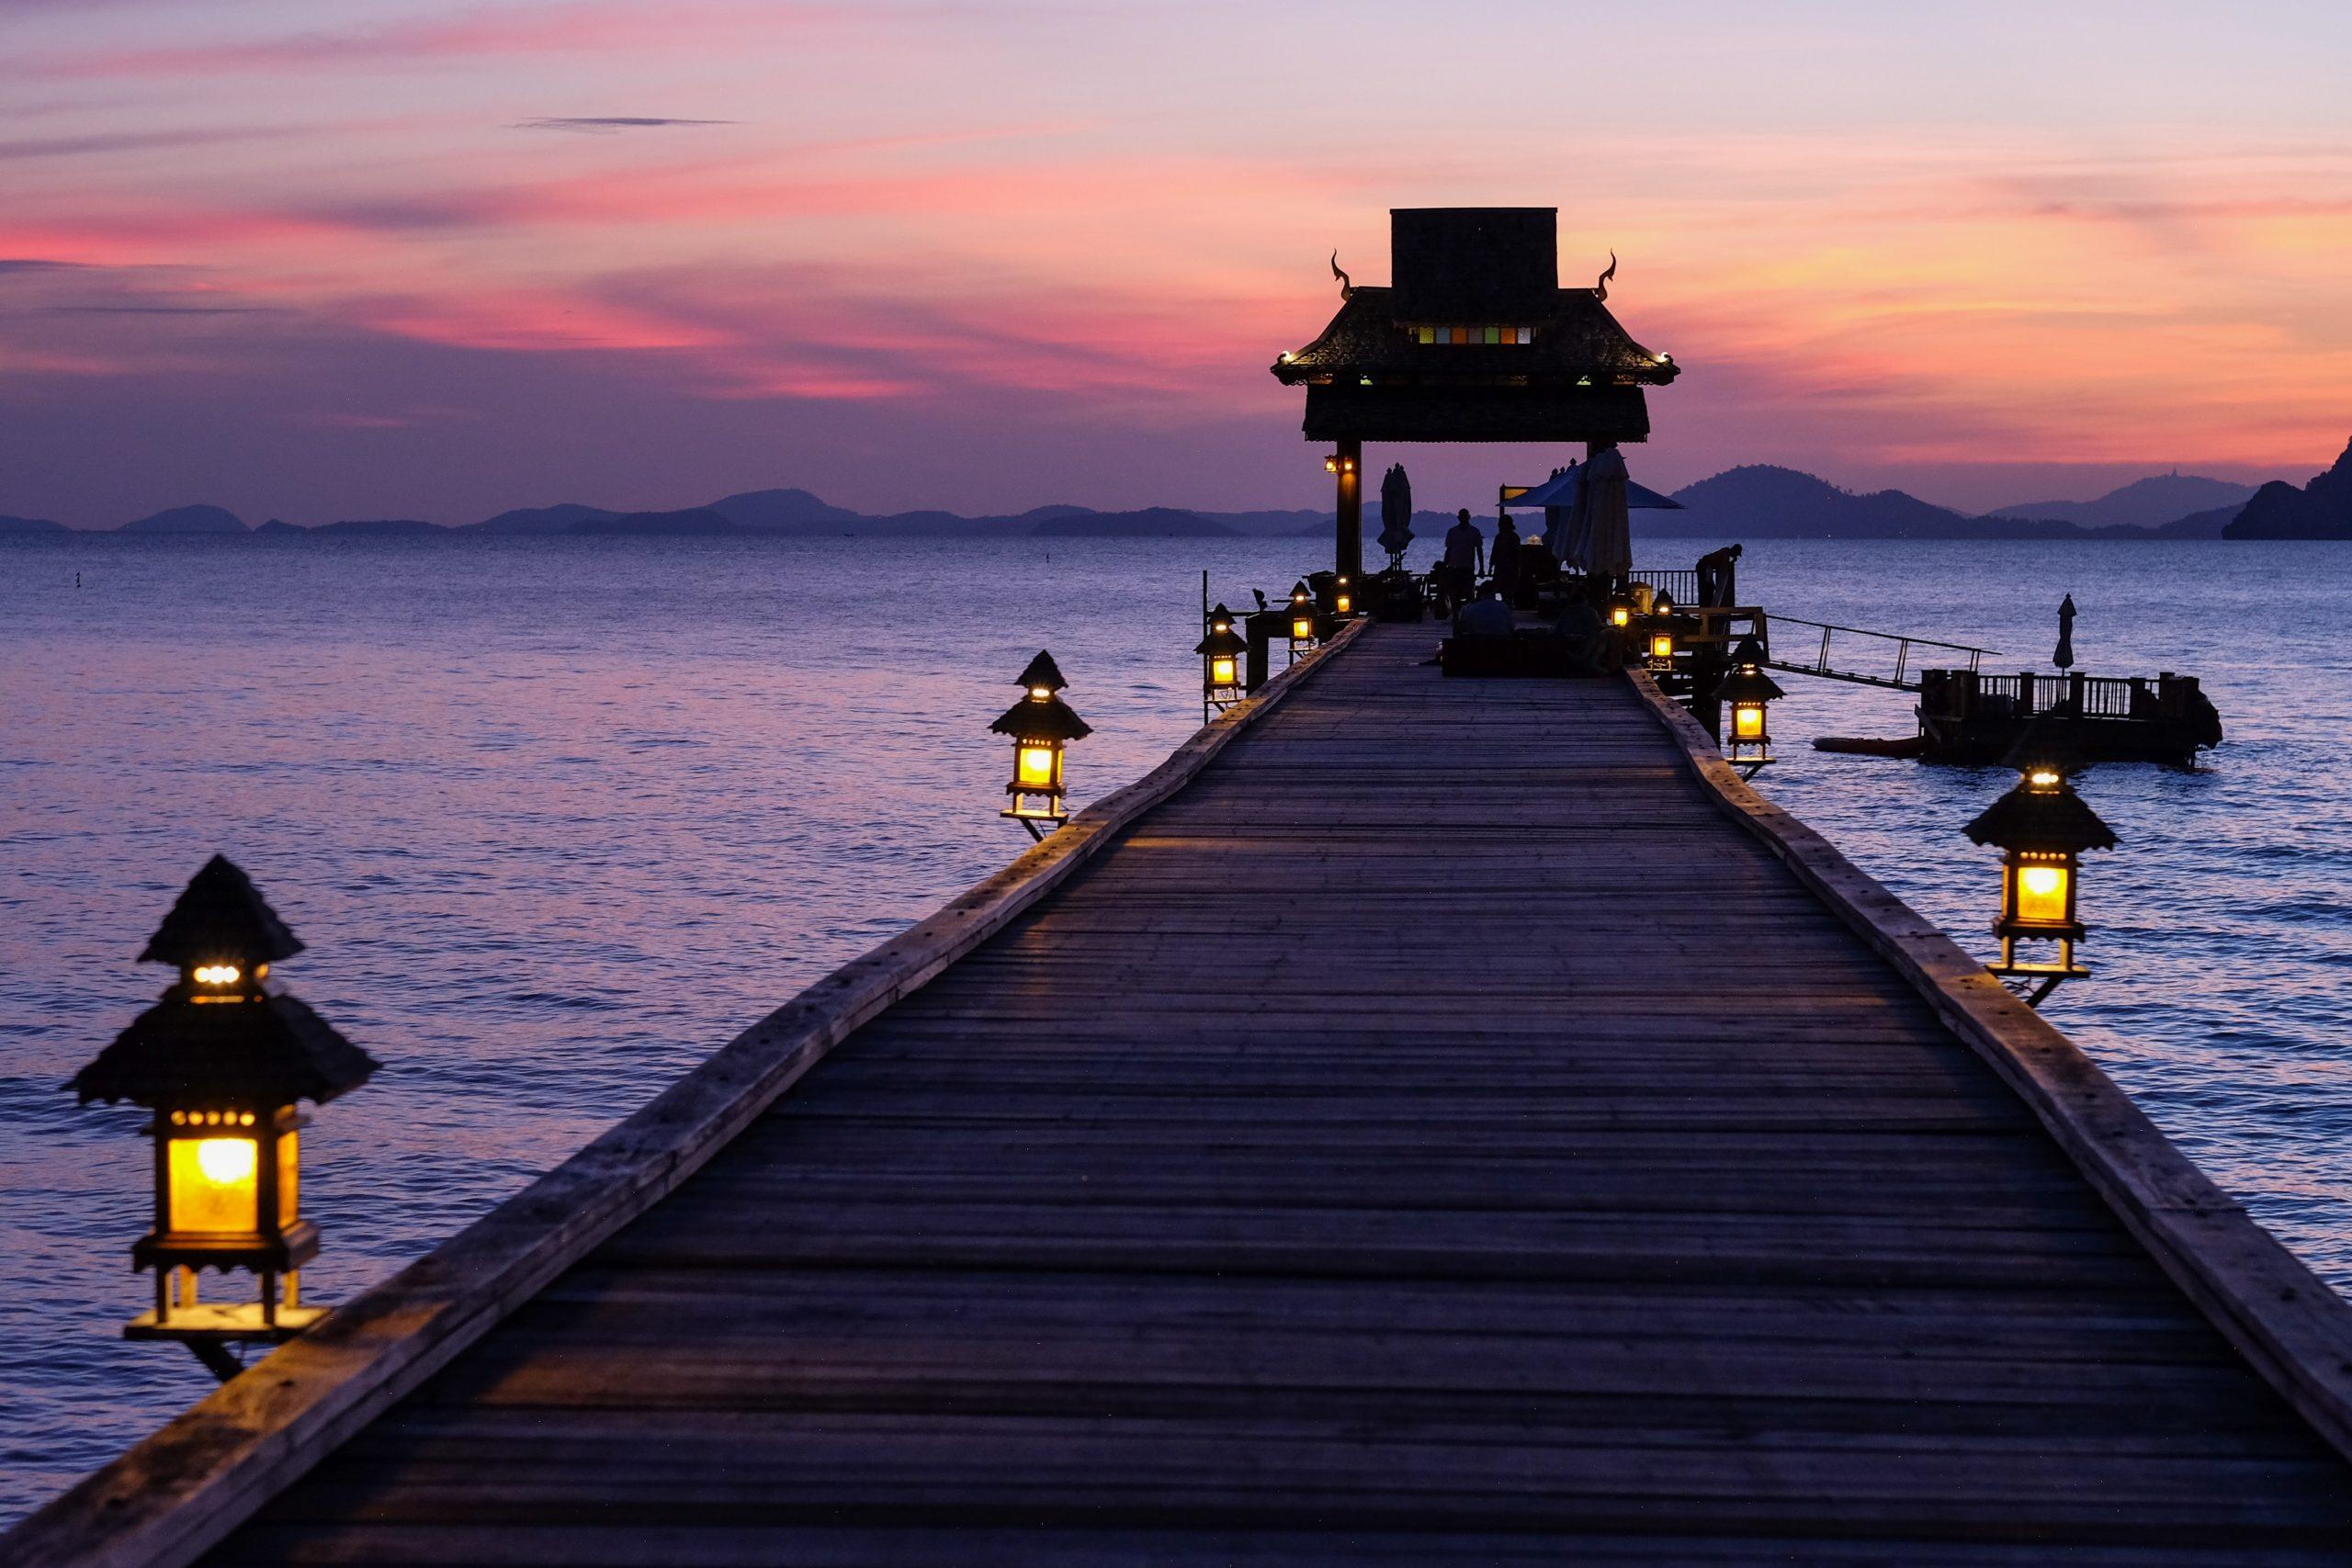 Koh Yao Yai Thailand By Alin Meceanu [Source : unsplash]